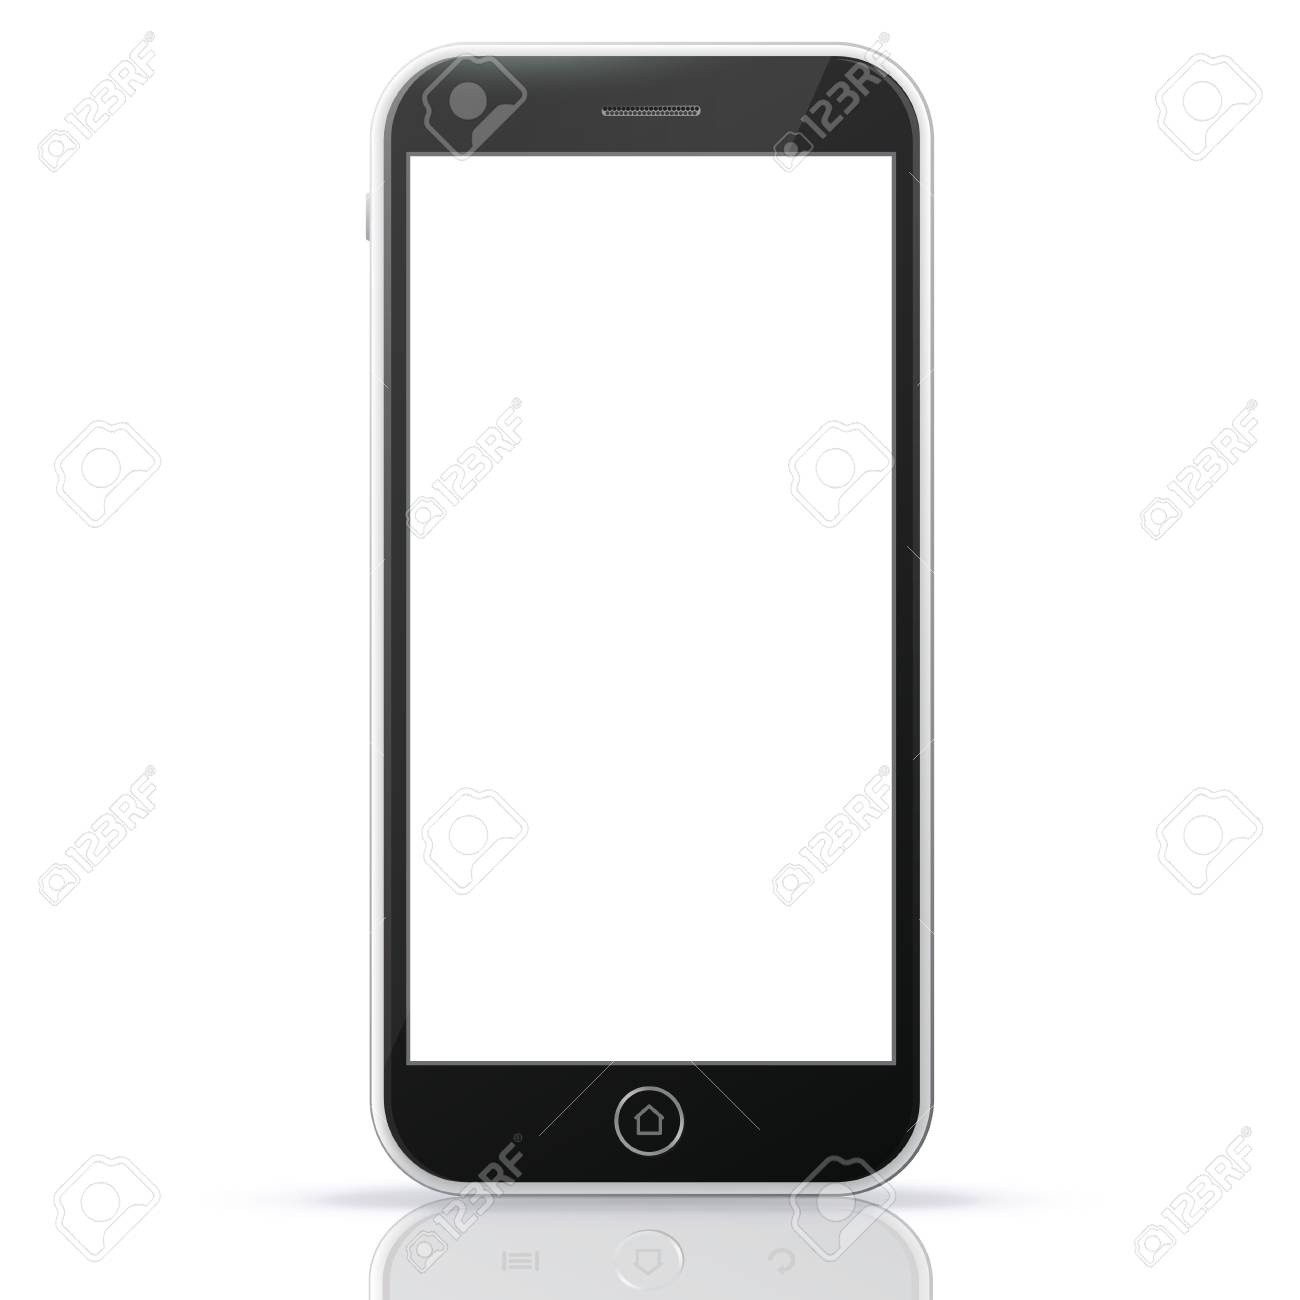 Black Smart Phone Vector Illustration - 73964943